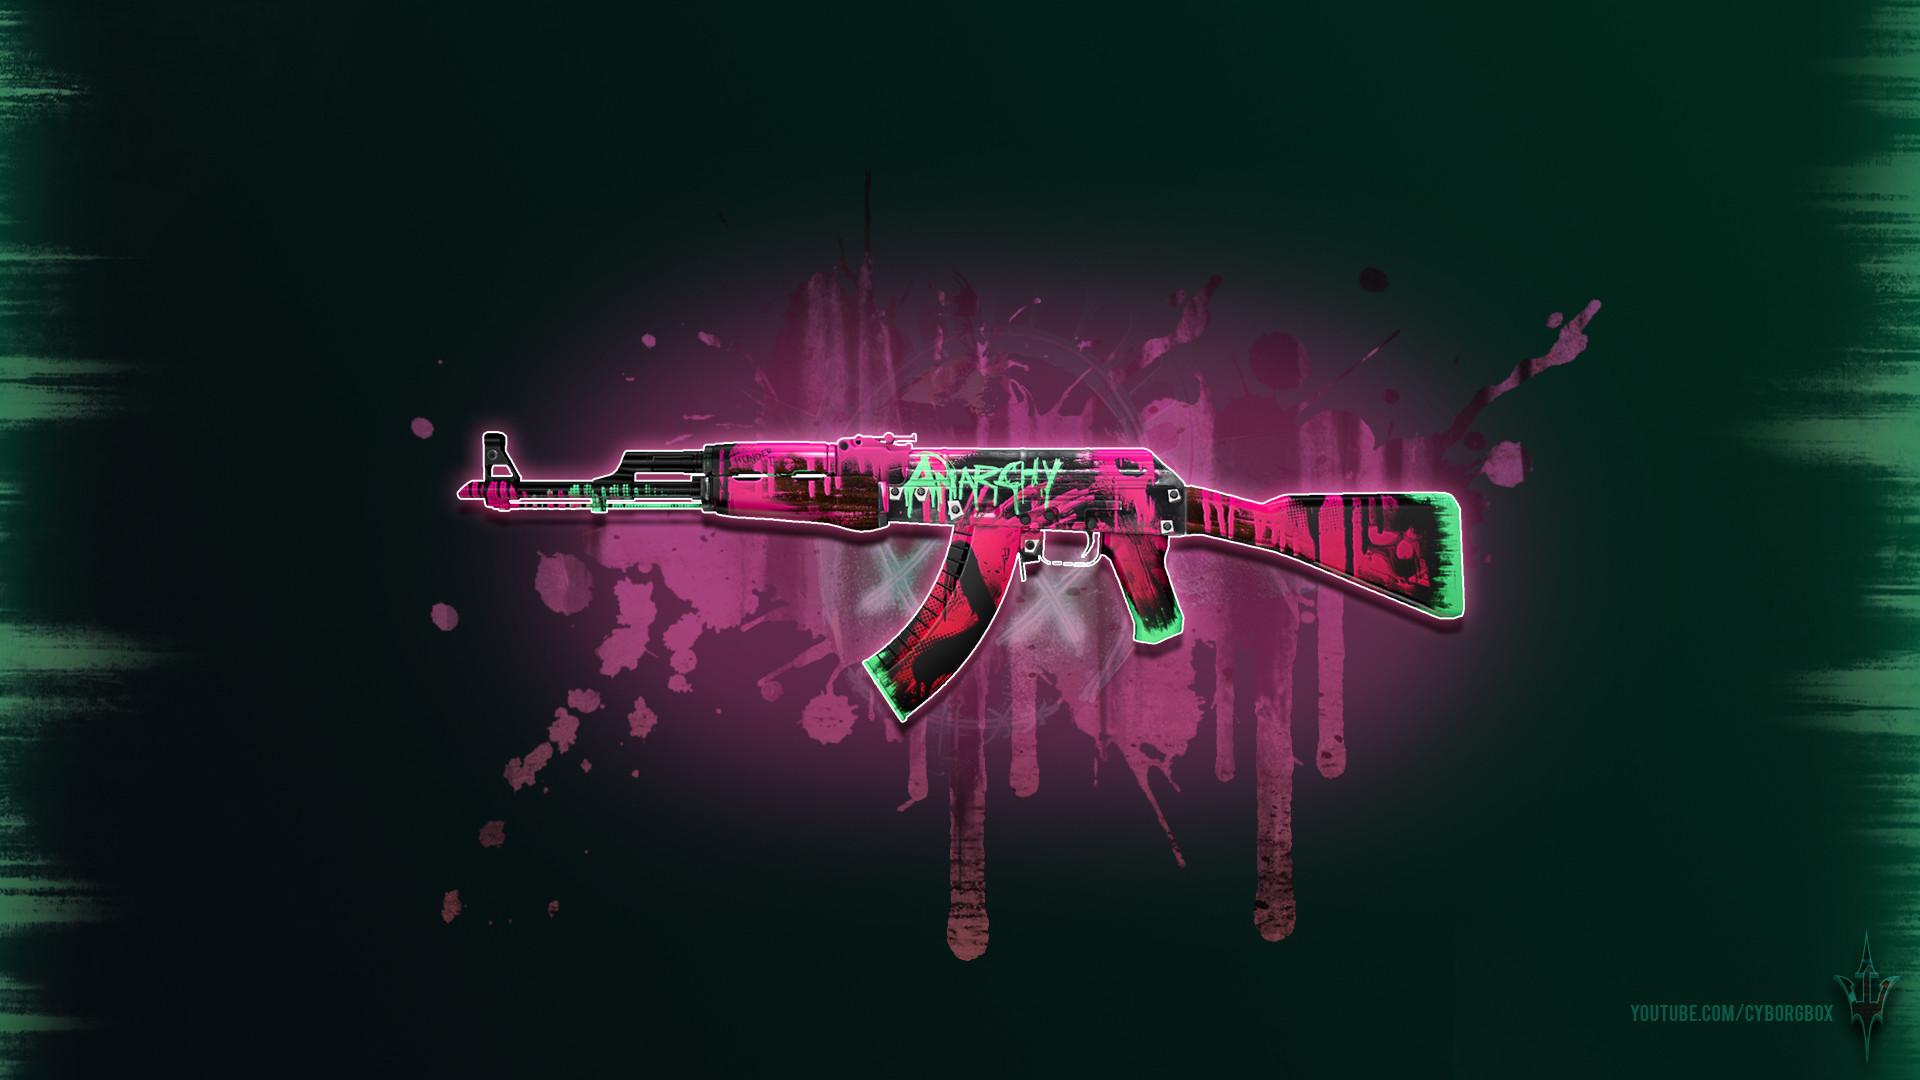 CSGO AK 47 Neon Revolution Wallpaper 1080p